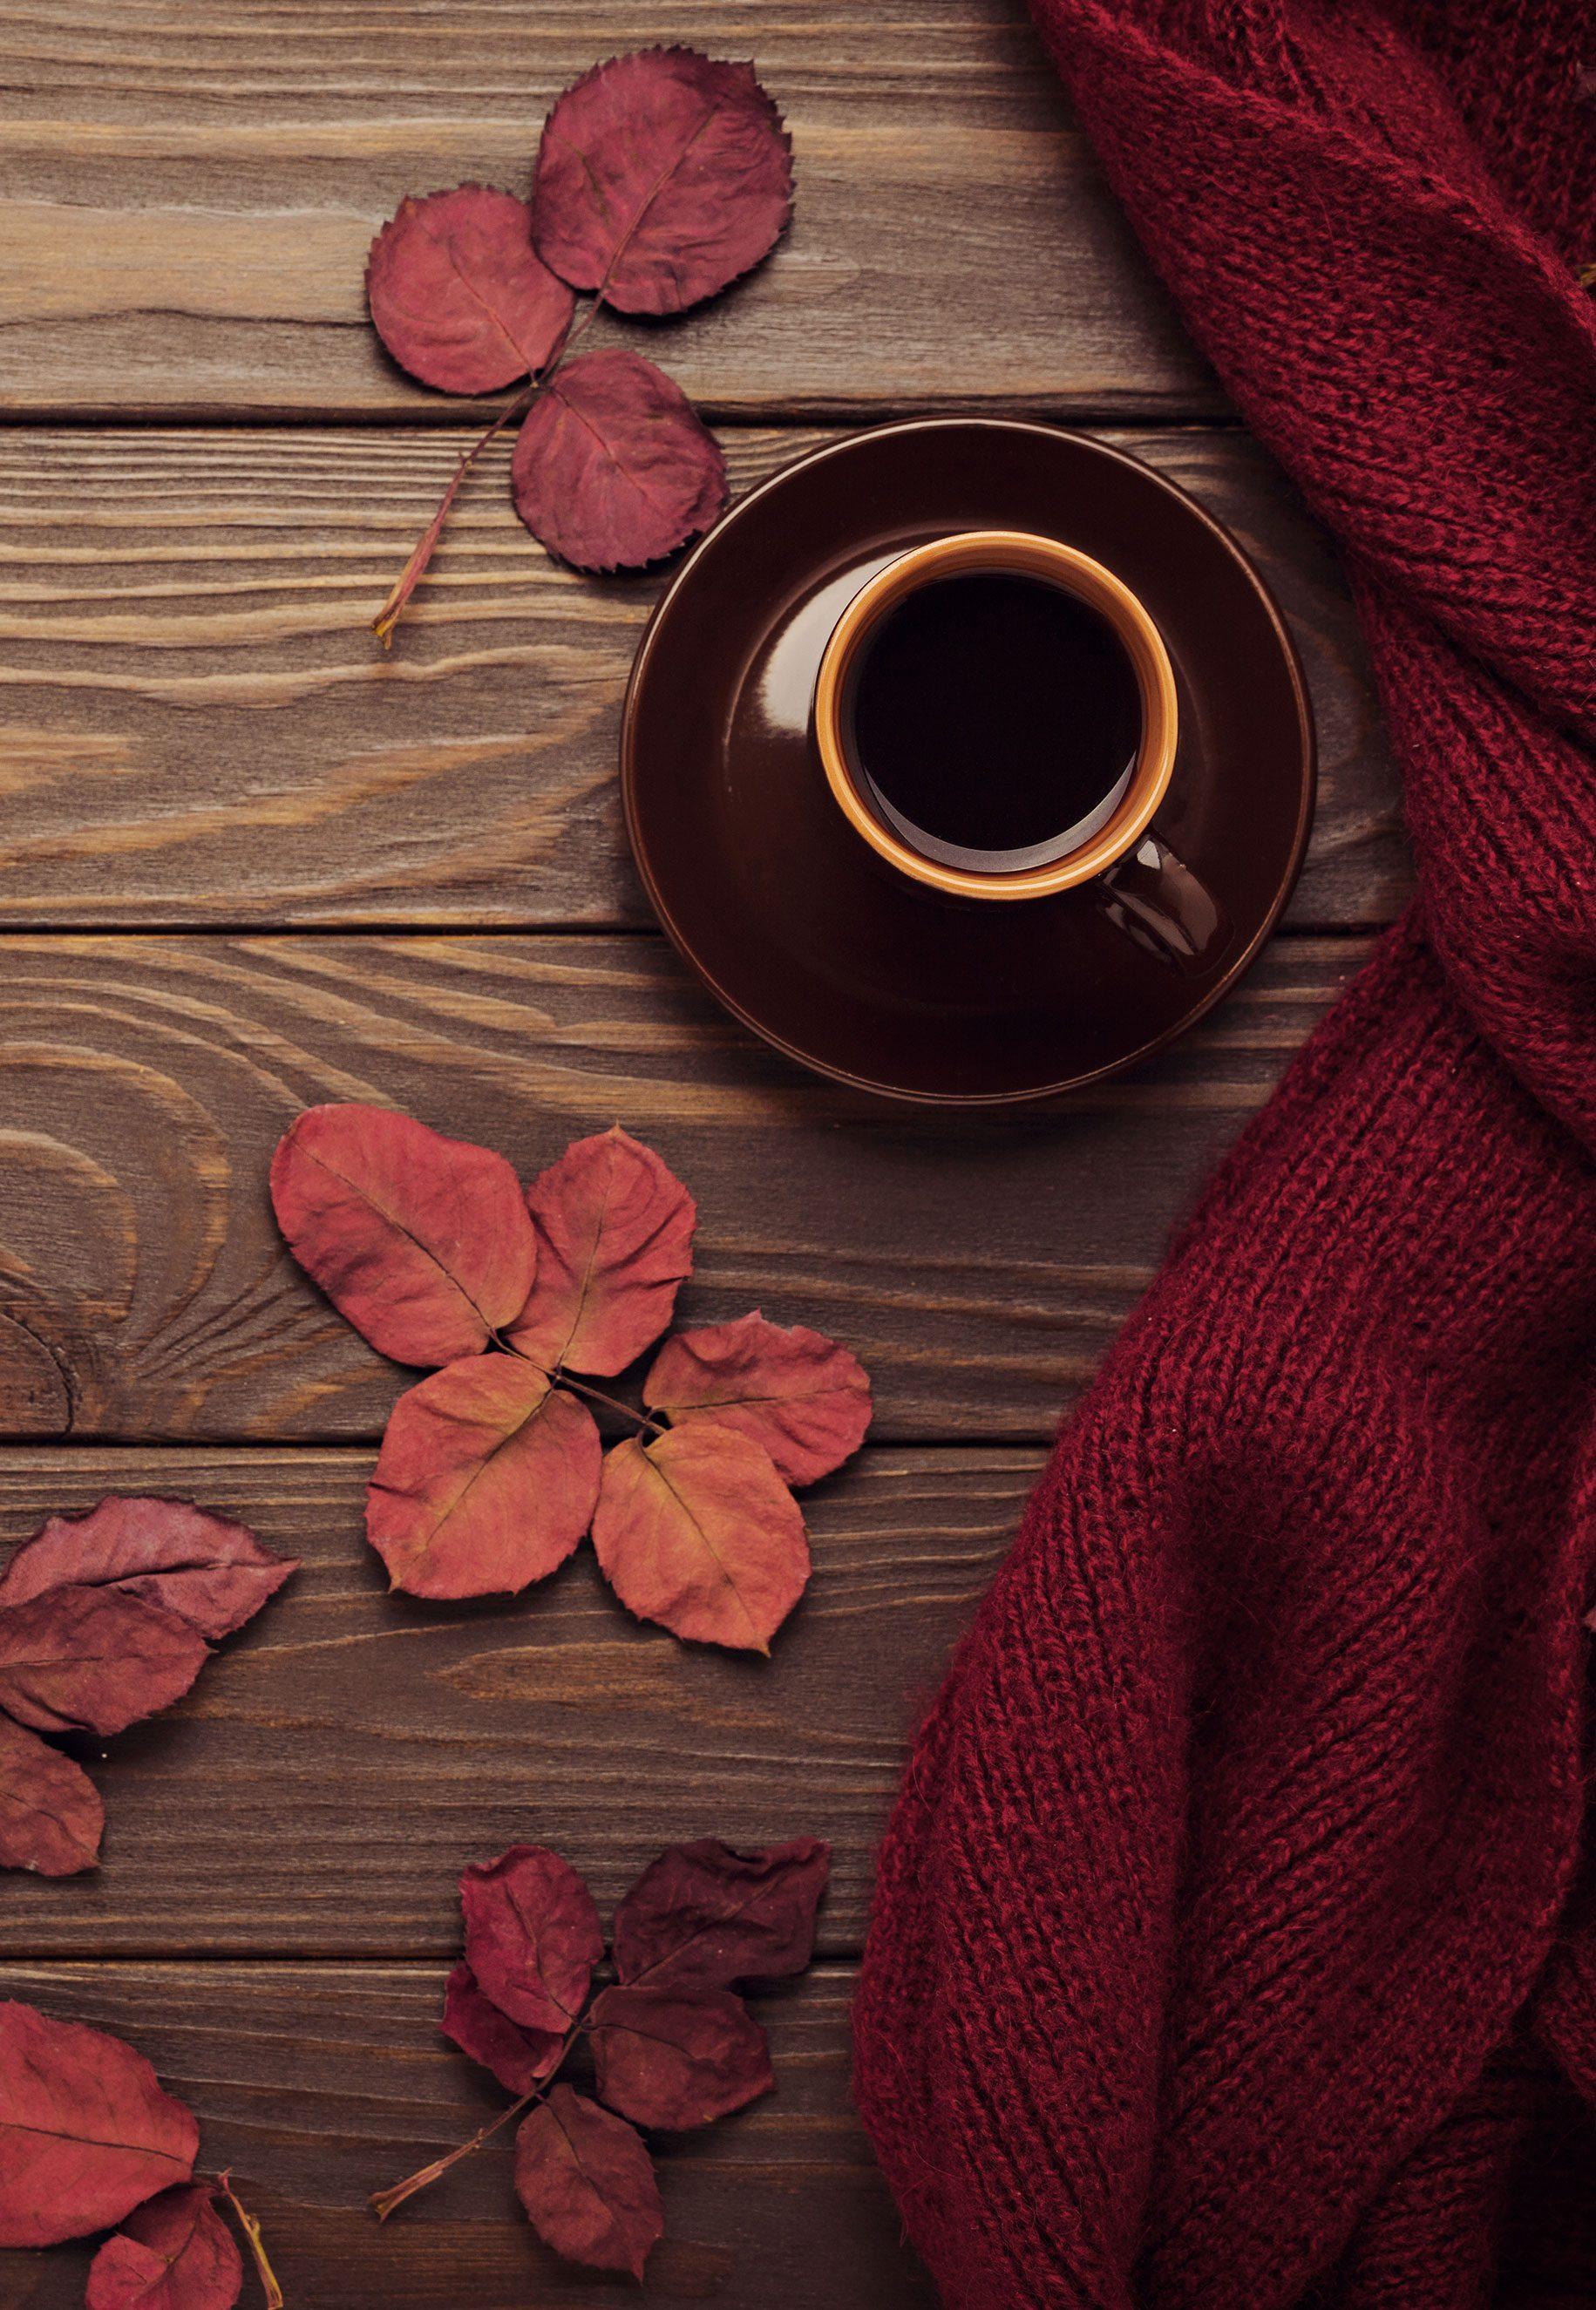 http://lookbook.allee-du-foulard.fr/wp-content/uploads/2018/09/0699-ADF-Accessoires-de-mode-LB-Colorama-automne-Ambiance-3-1831x2650.jpg